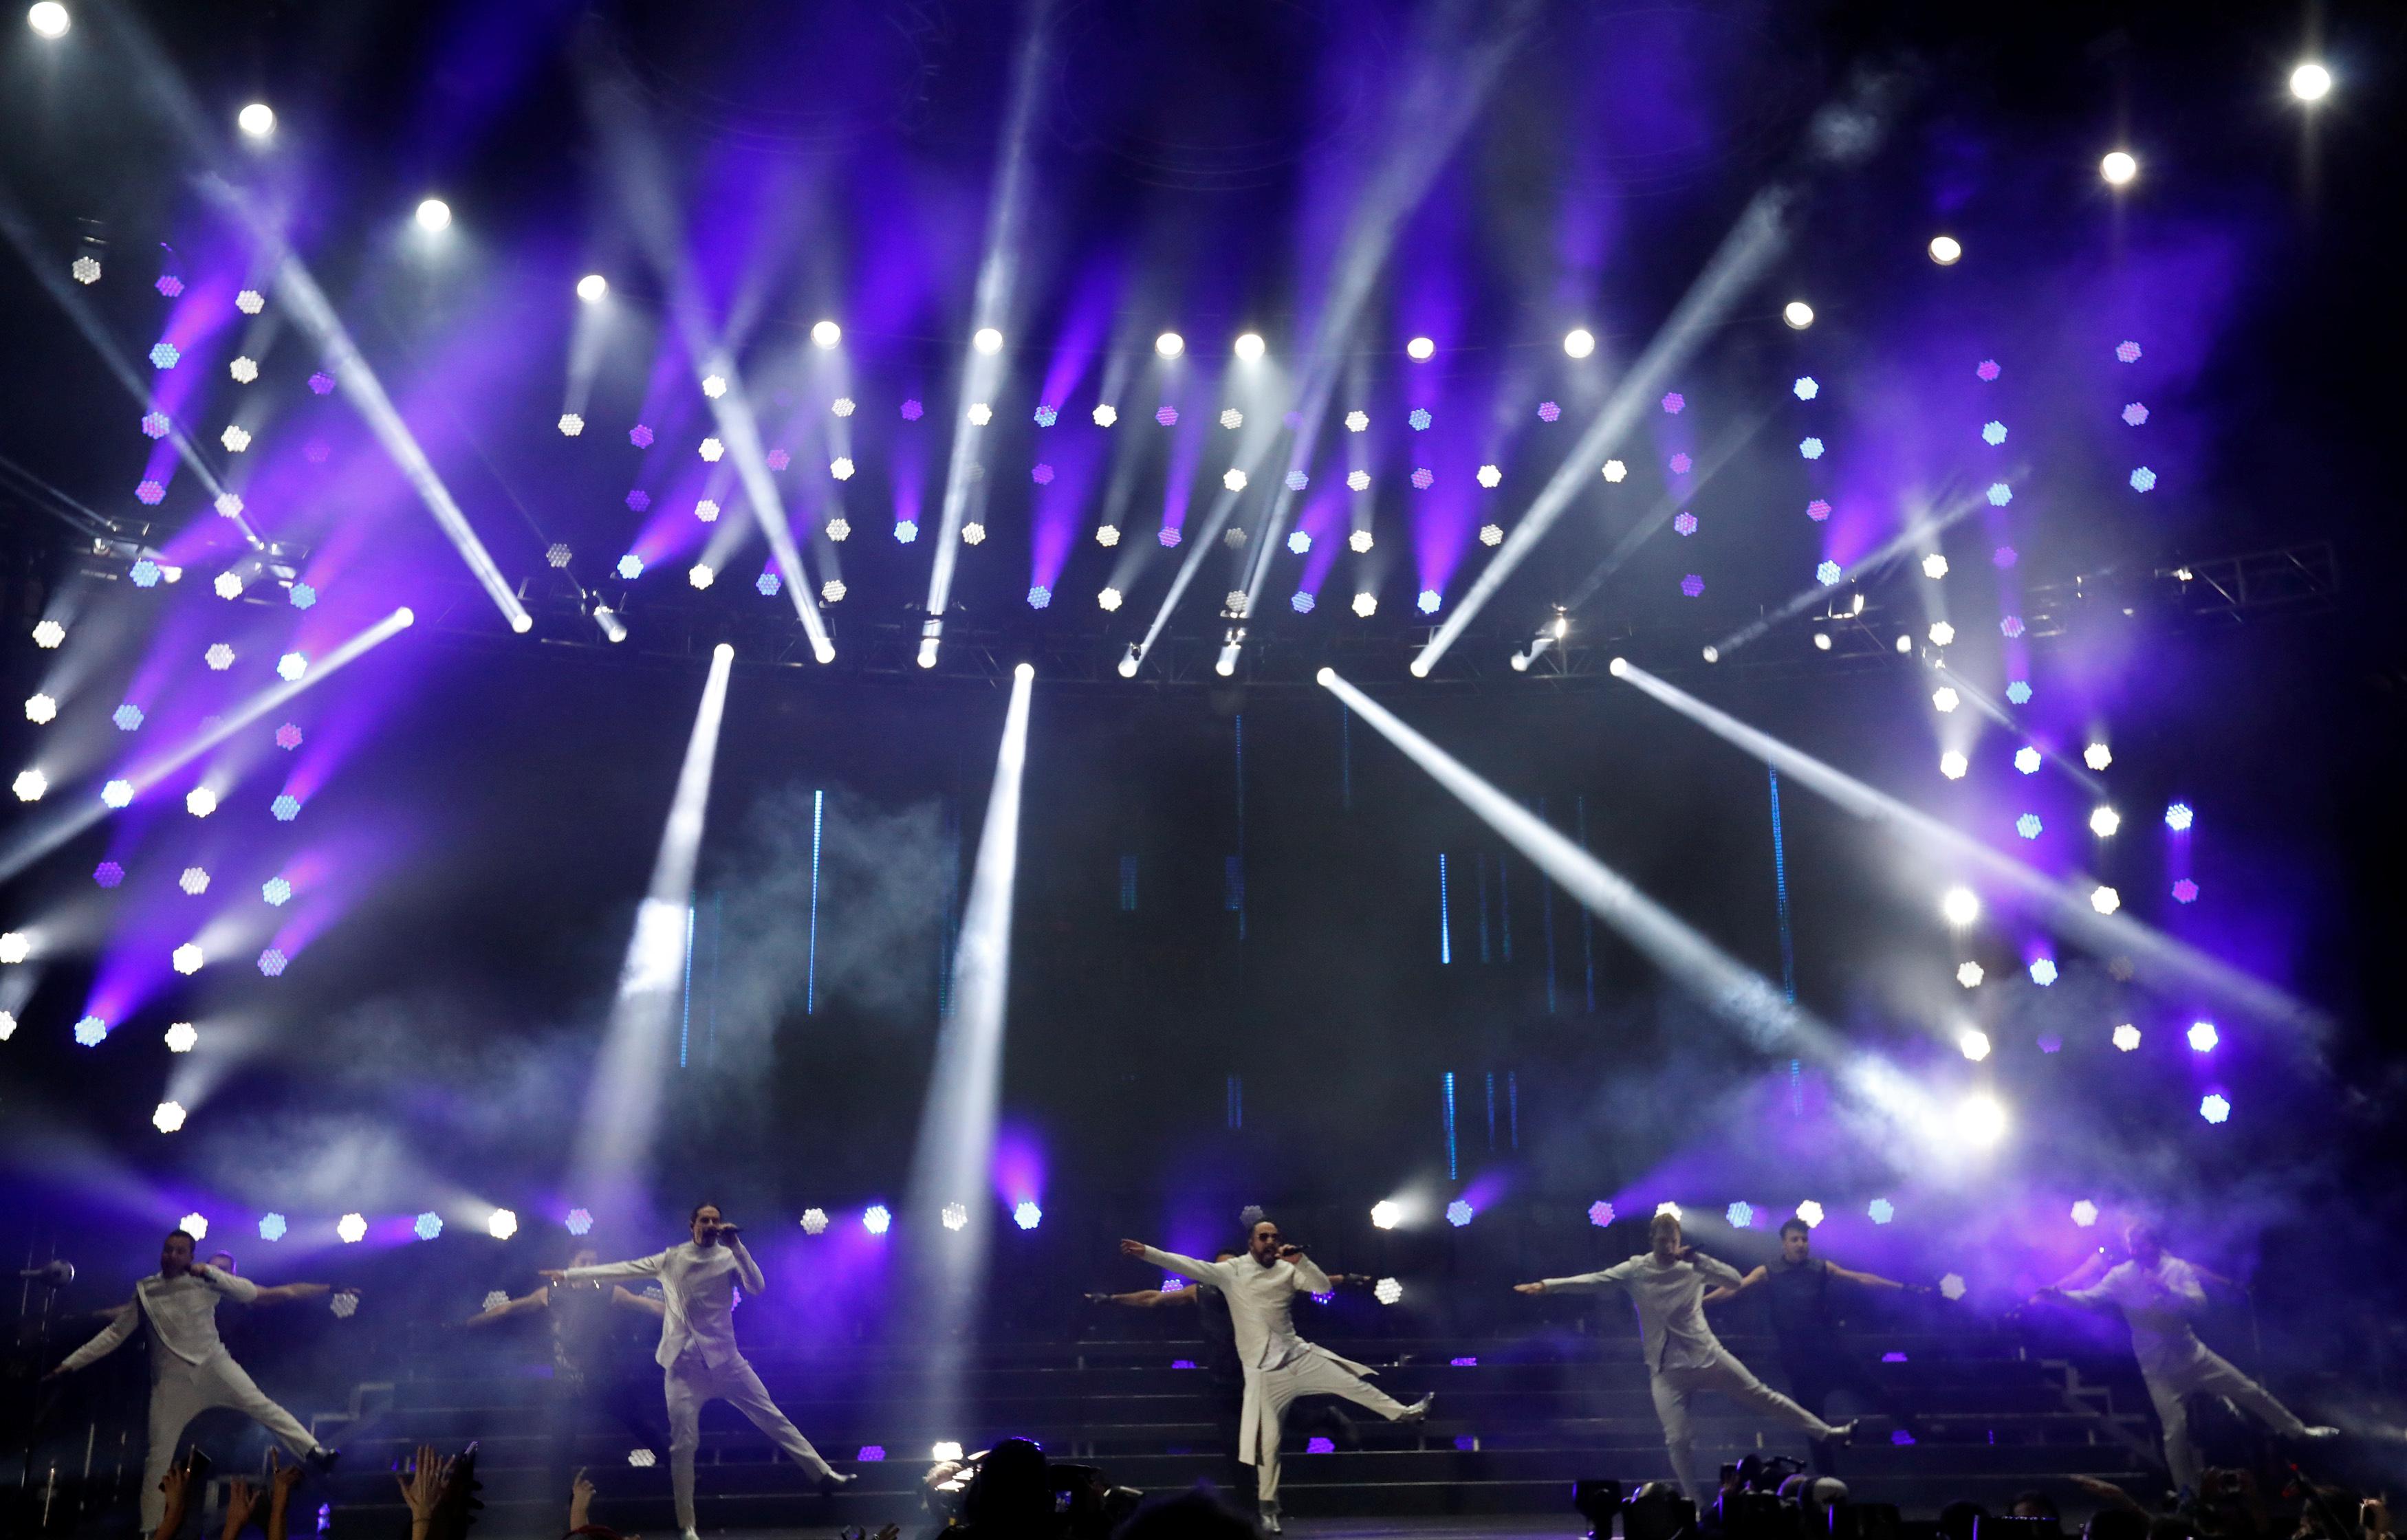 Backstreet Boys performs at Wango Tango concert in Carson